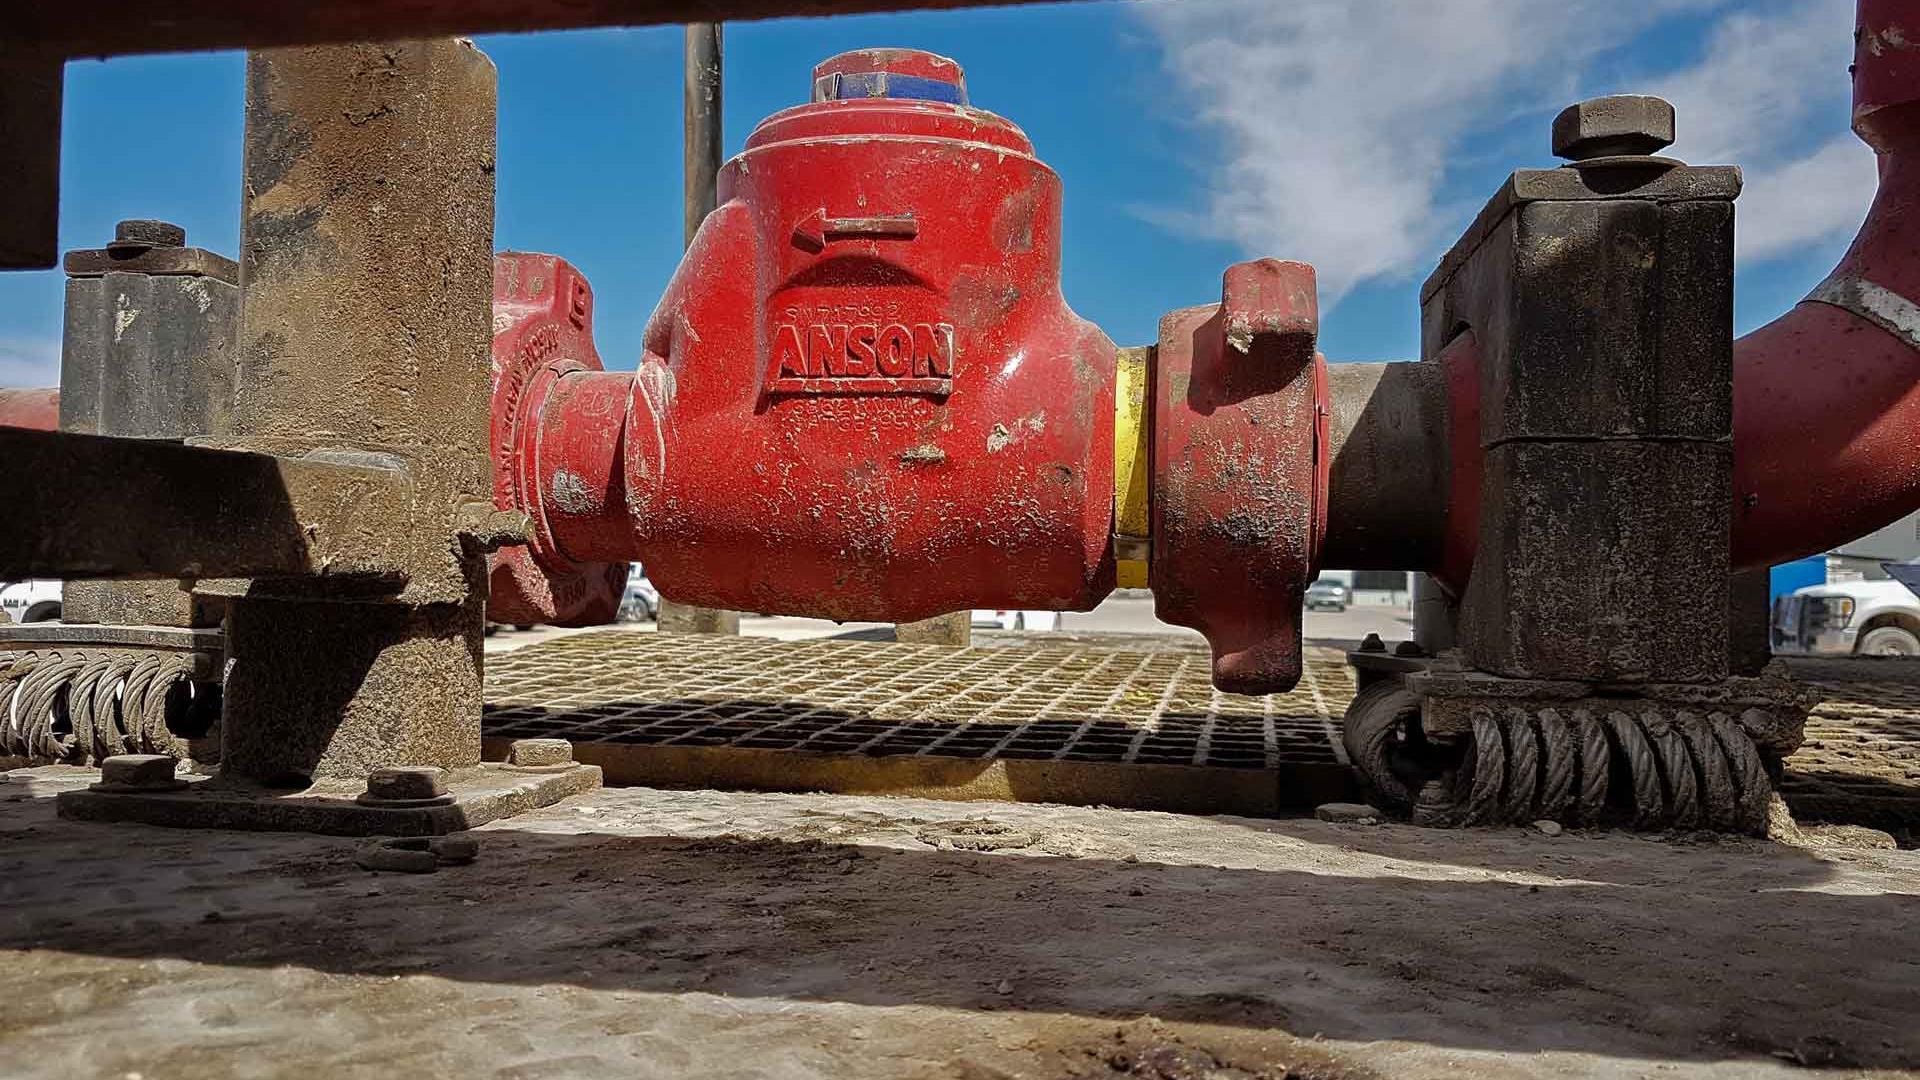 Anson plug valves on rig site